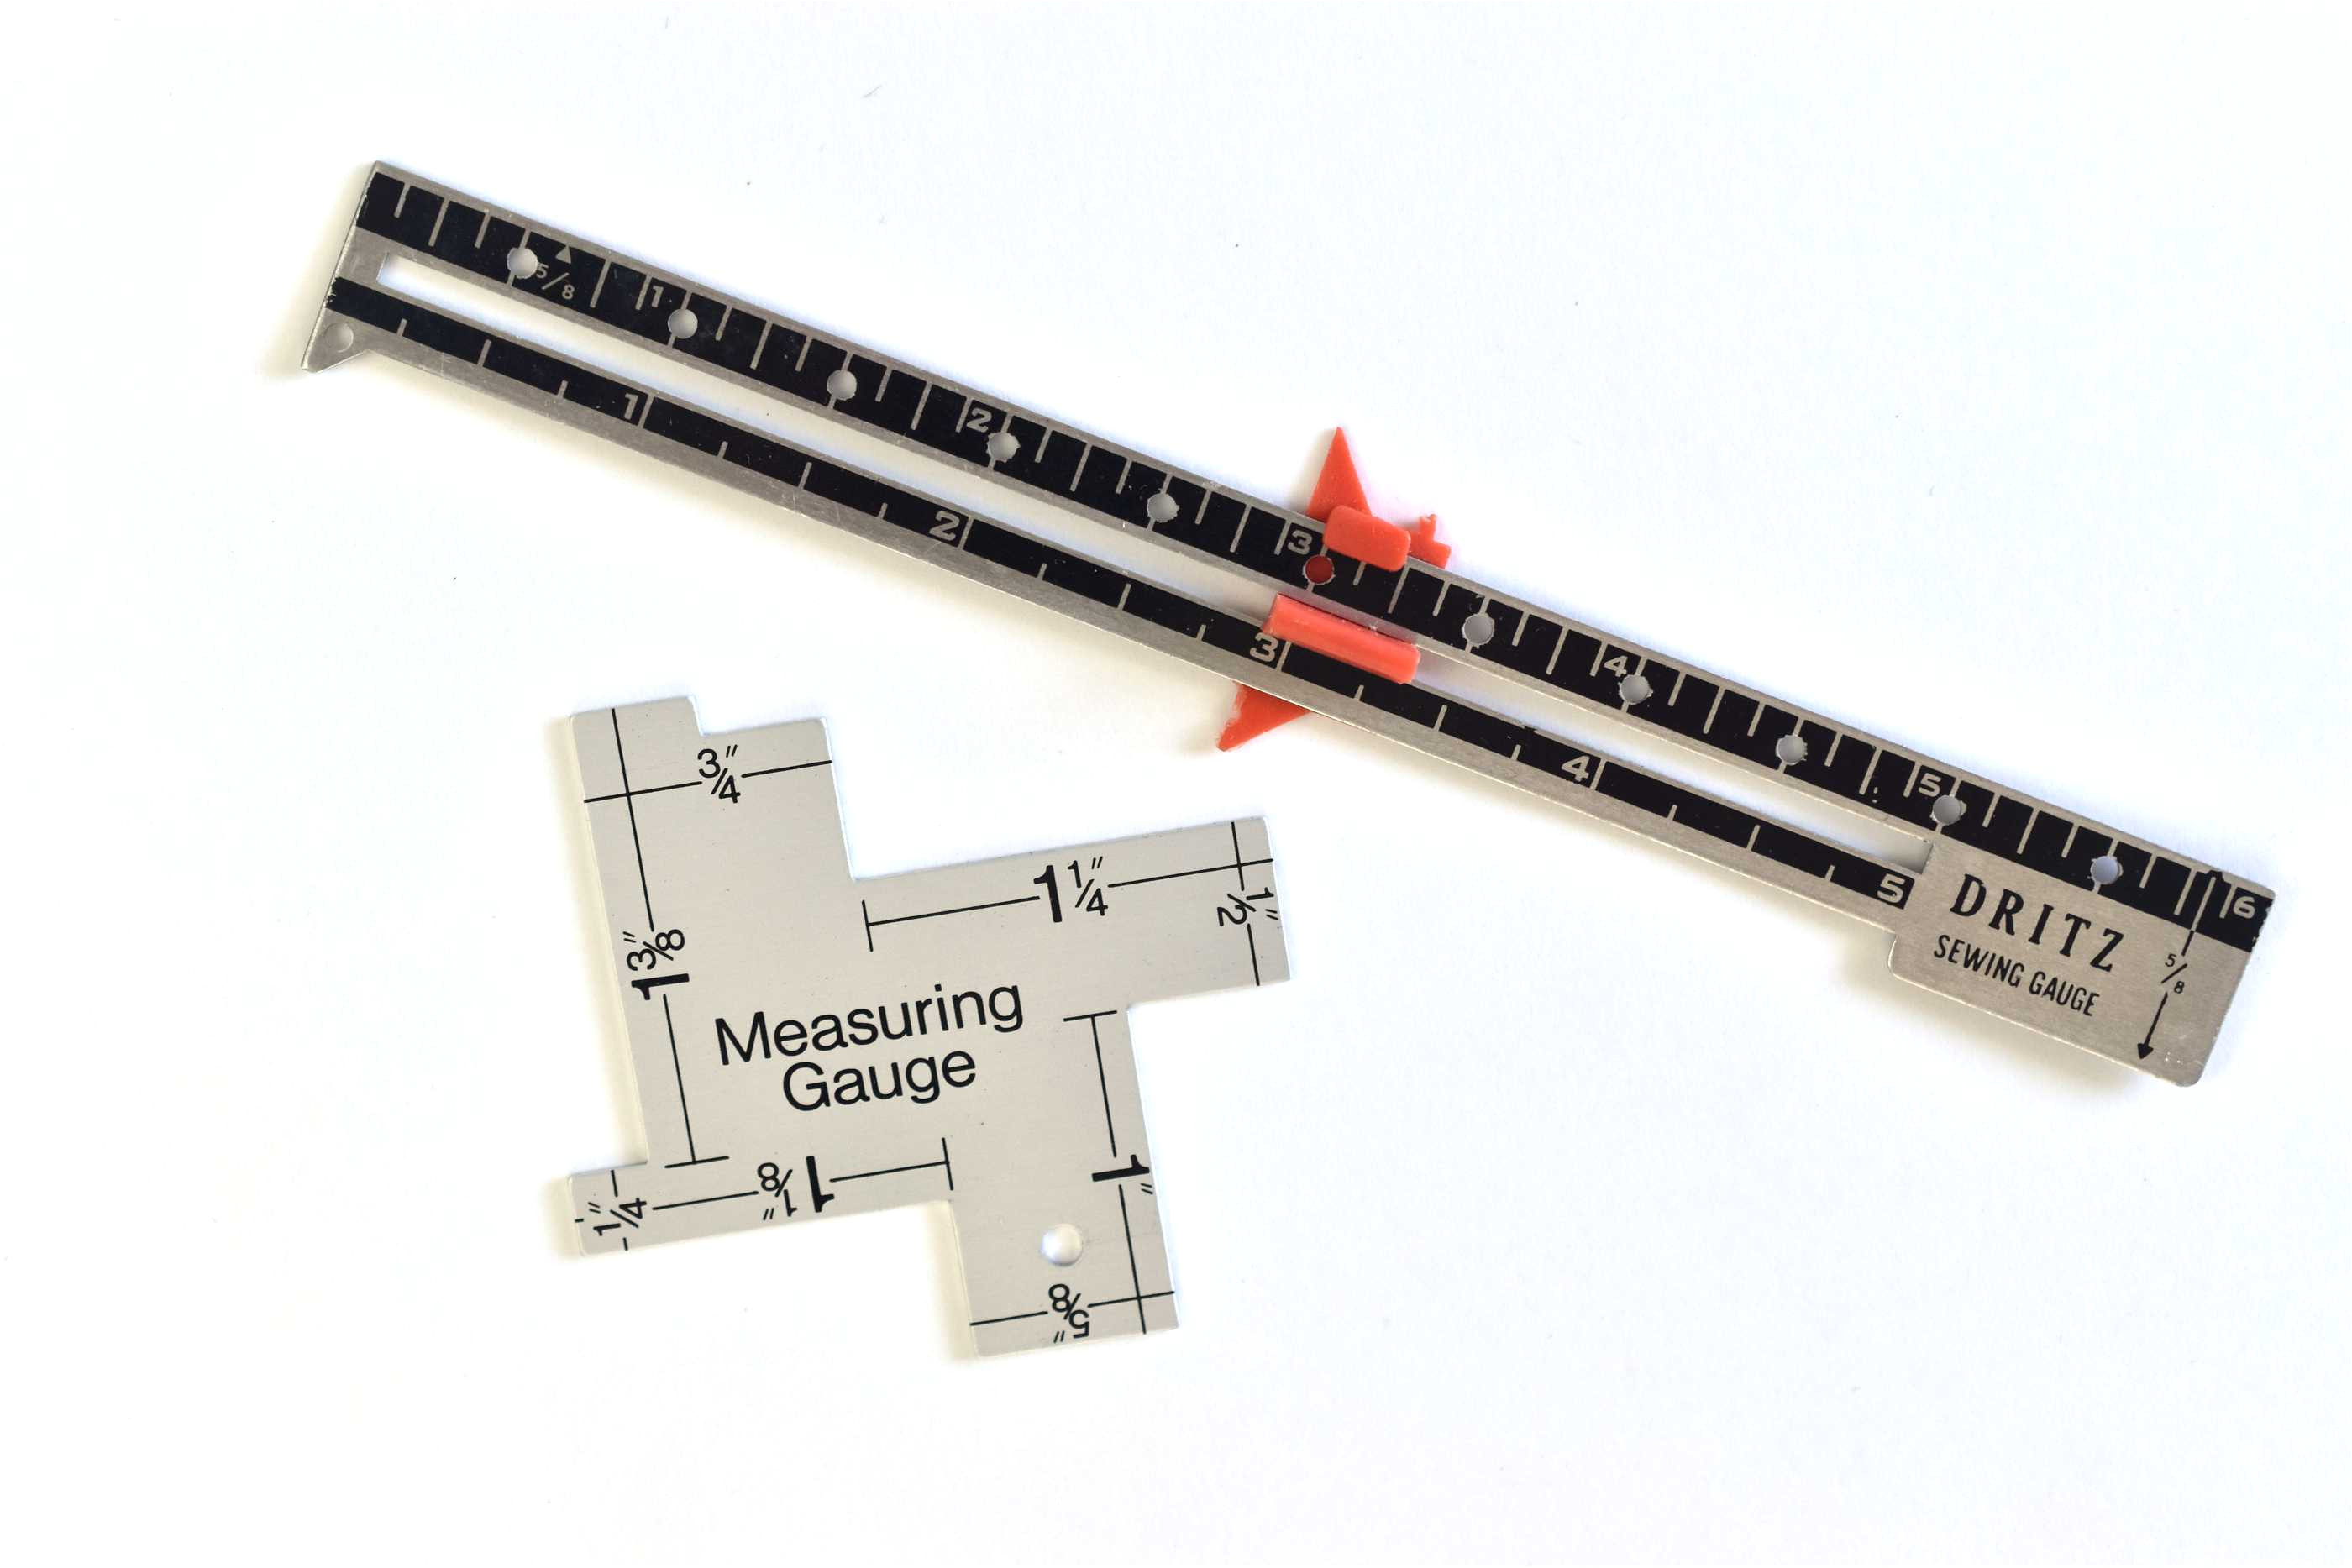 sewingtools measuringgauge 5b19b4233128340036f2921a jpg